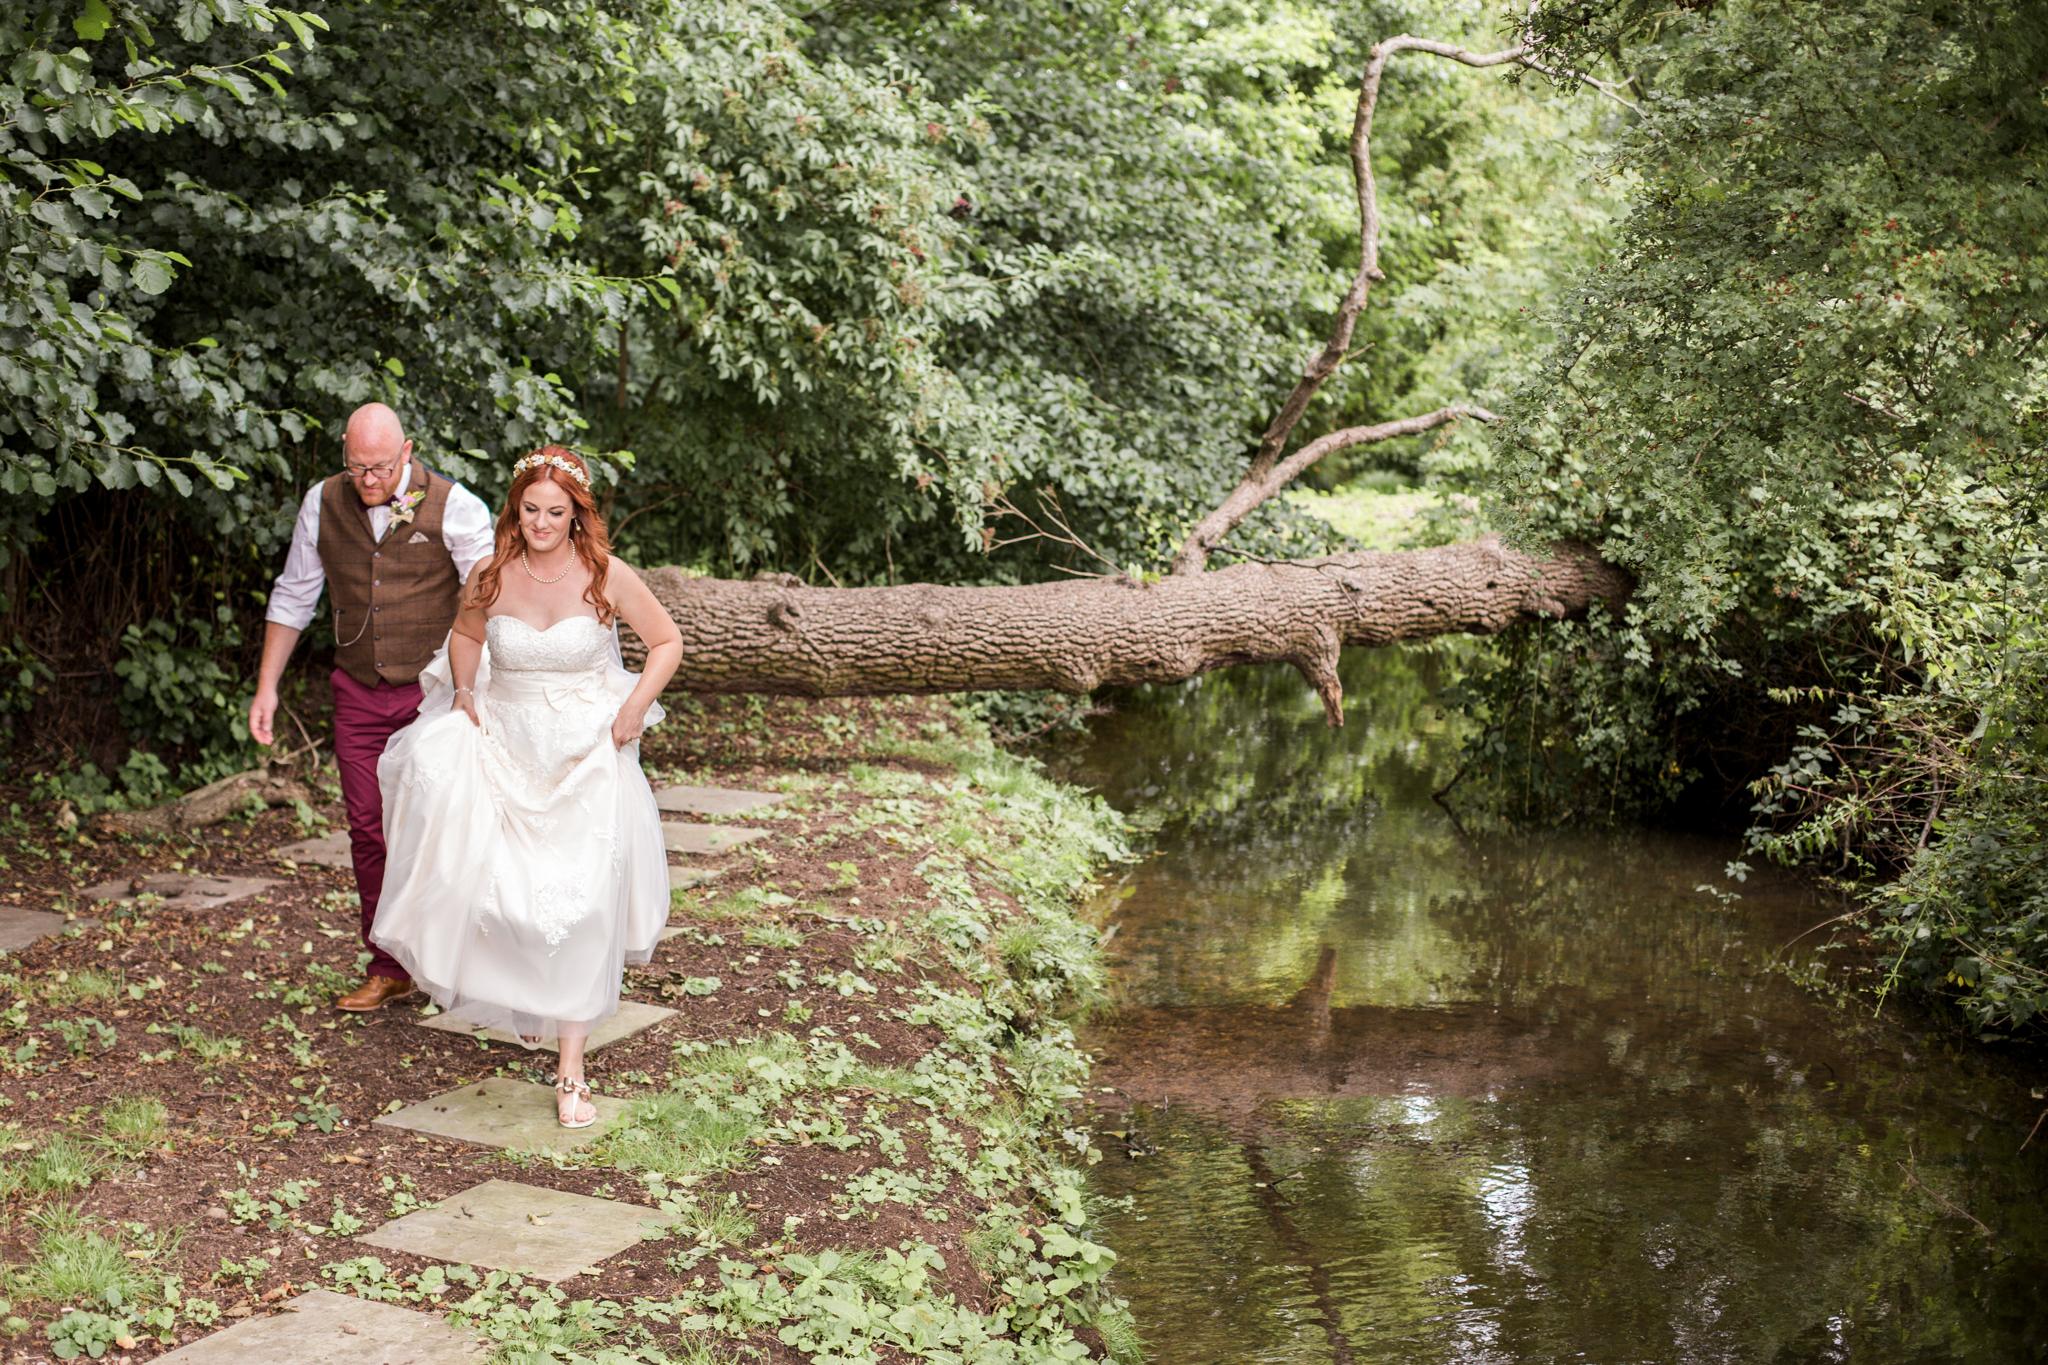 Rowsie & Lee, Swallows Nest Barn Wedding, Cotswold wedding photographer, Warwickshire Wedding Photographer-72.jpg